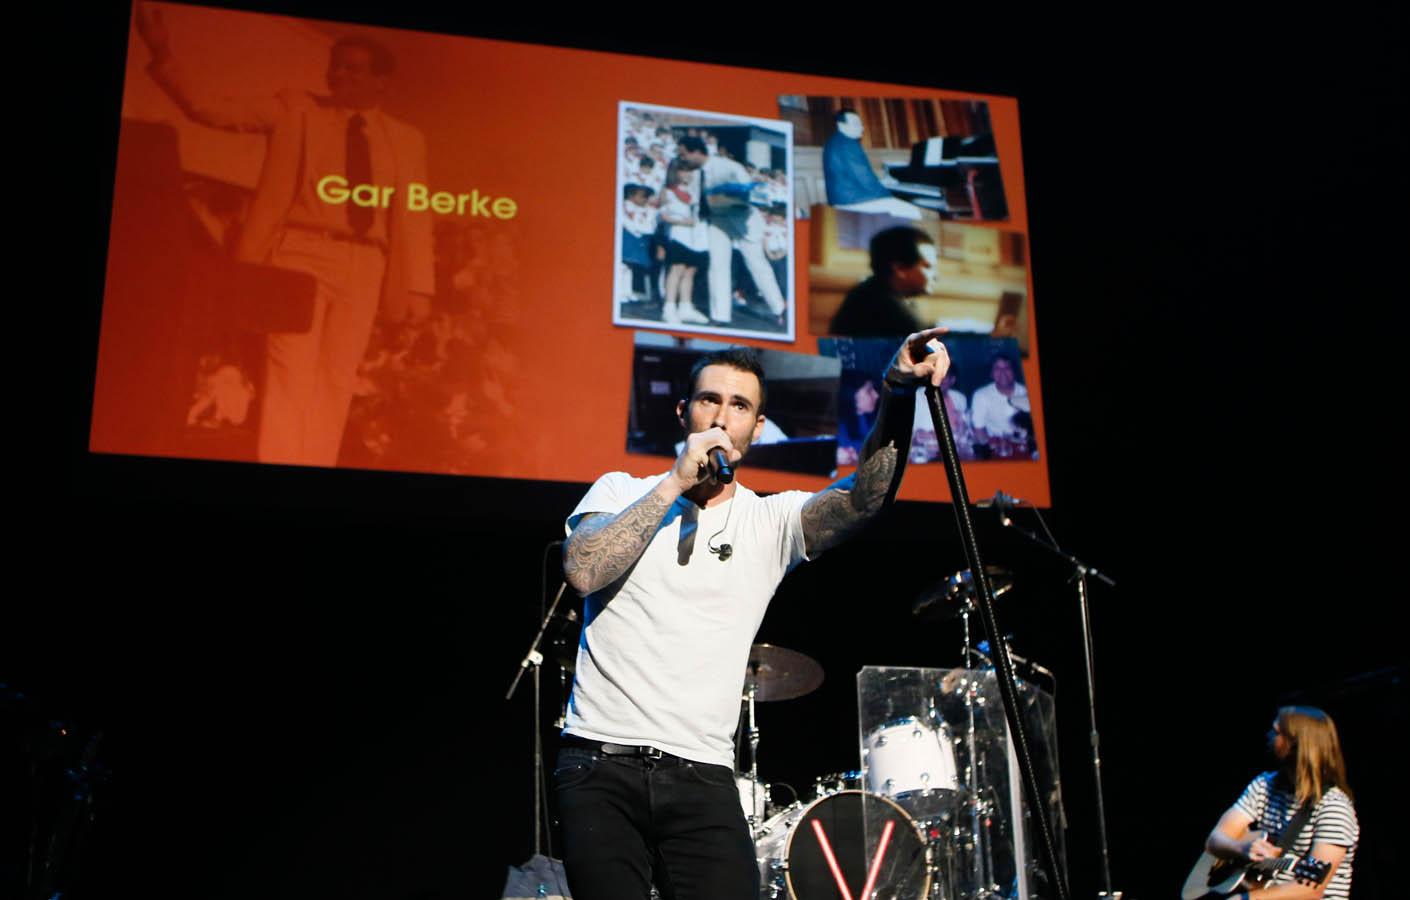 Adam Levine honoring Gar Burke